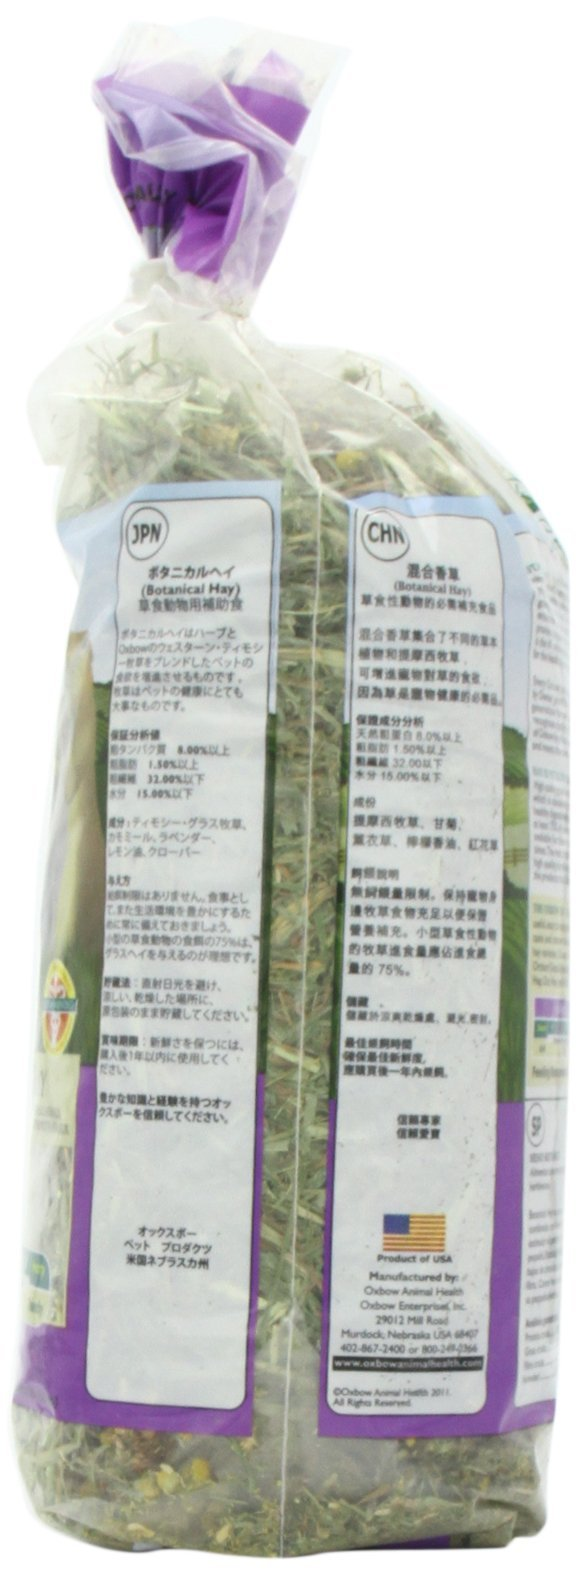 Oxbow Animal Health Botanical Hay for Pets, 15-Ounce